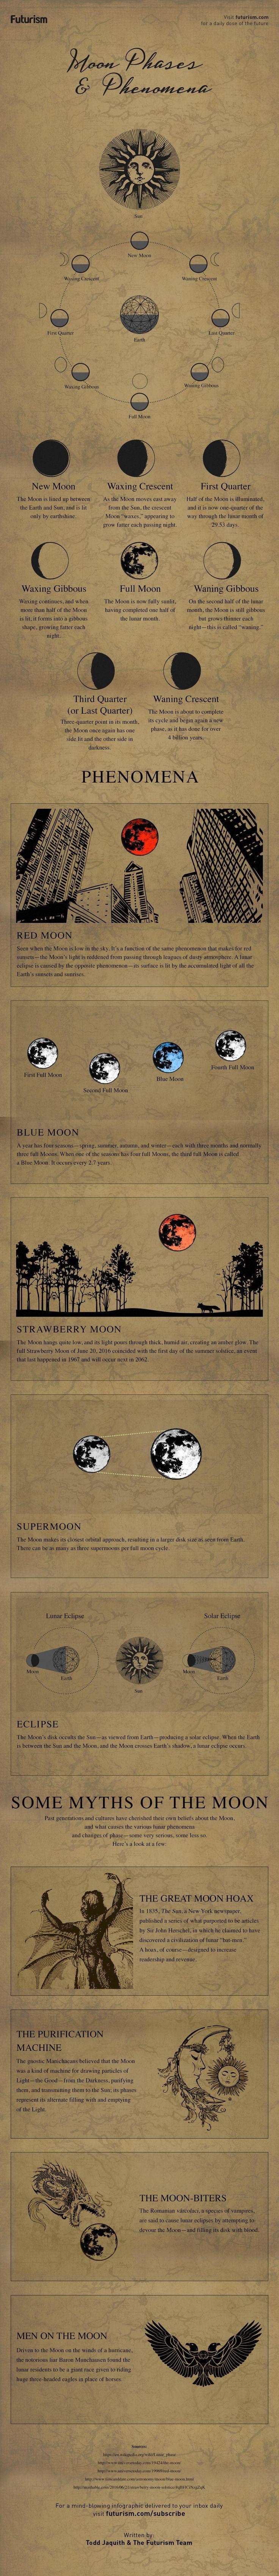 Moon phases and phenomena